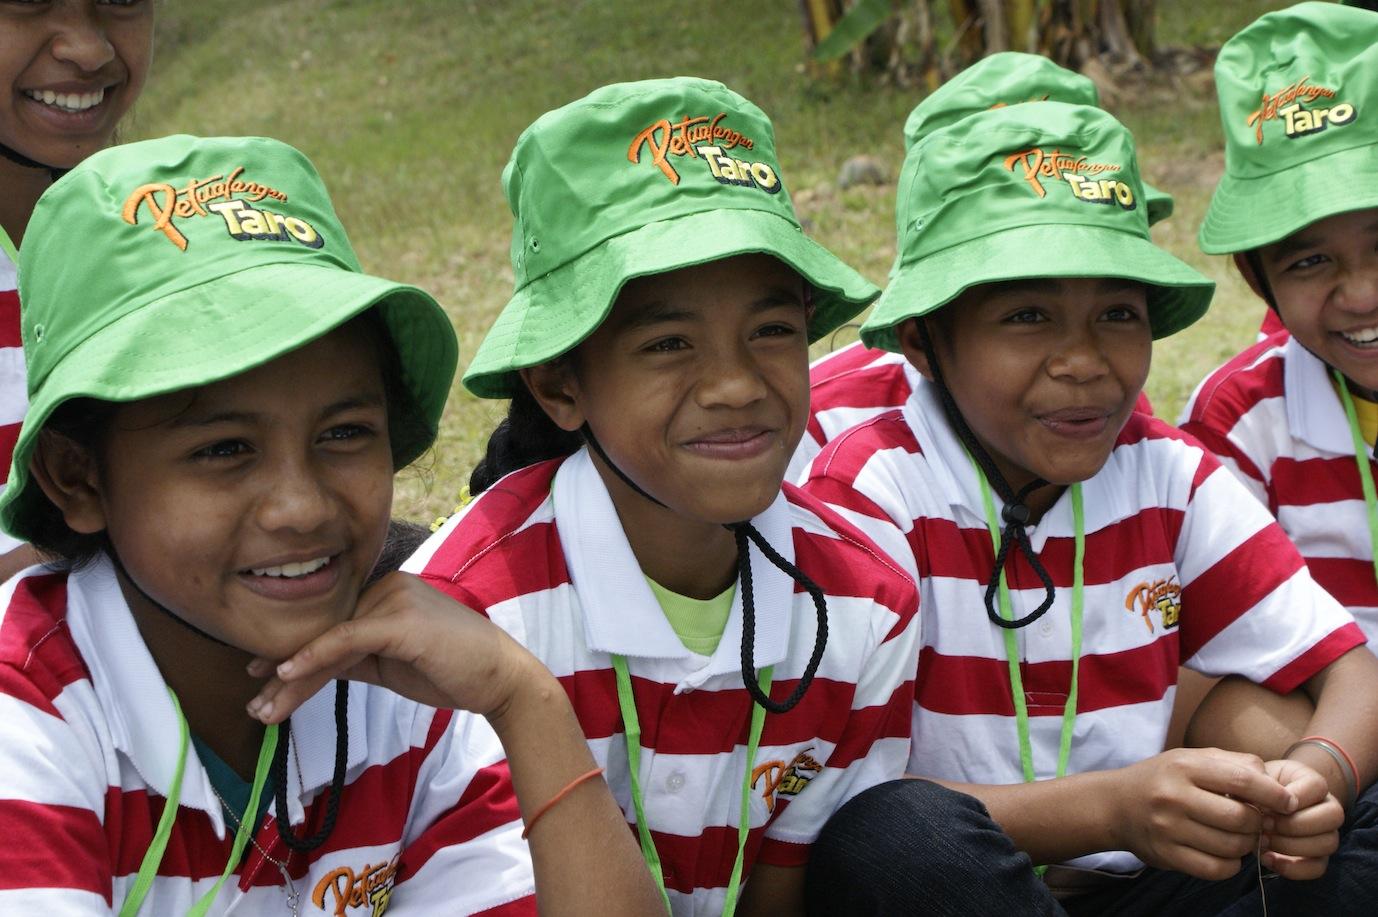 Anak di Taman Bacaan Pelangi tersenyum pada acara bersama Petualangan Taro di Kampung Roe